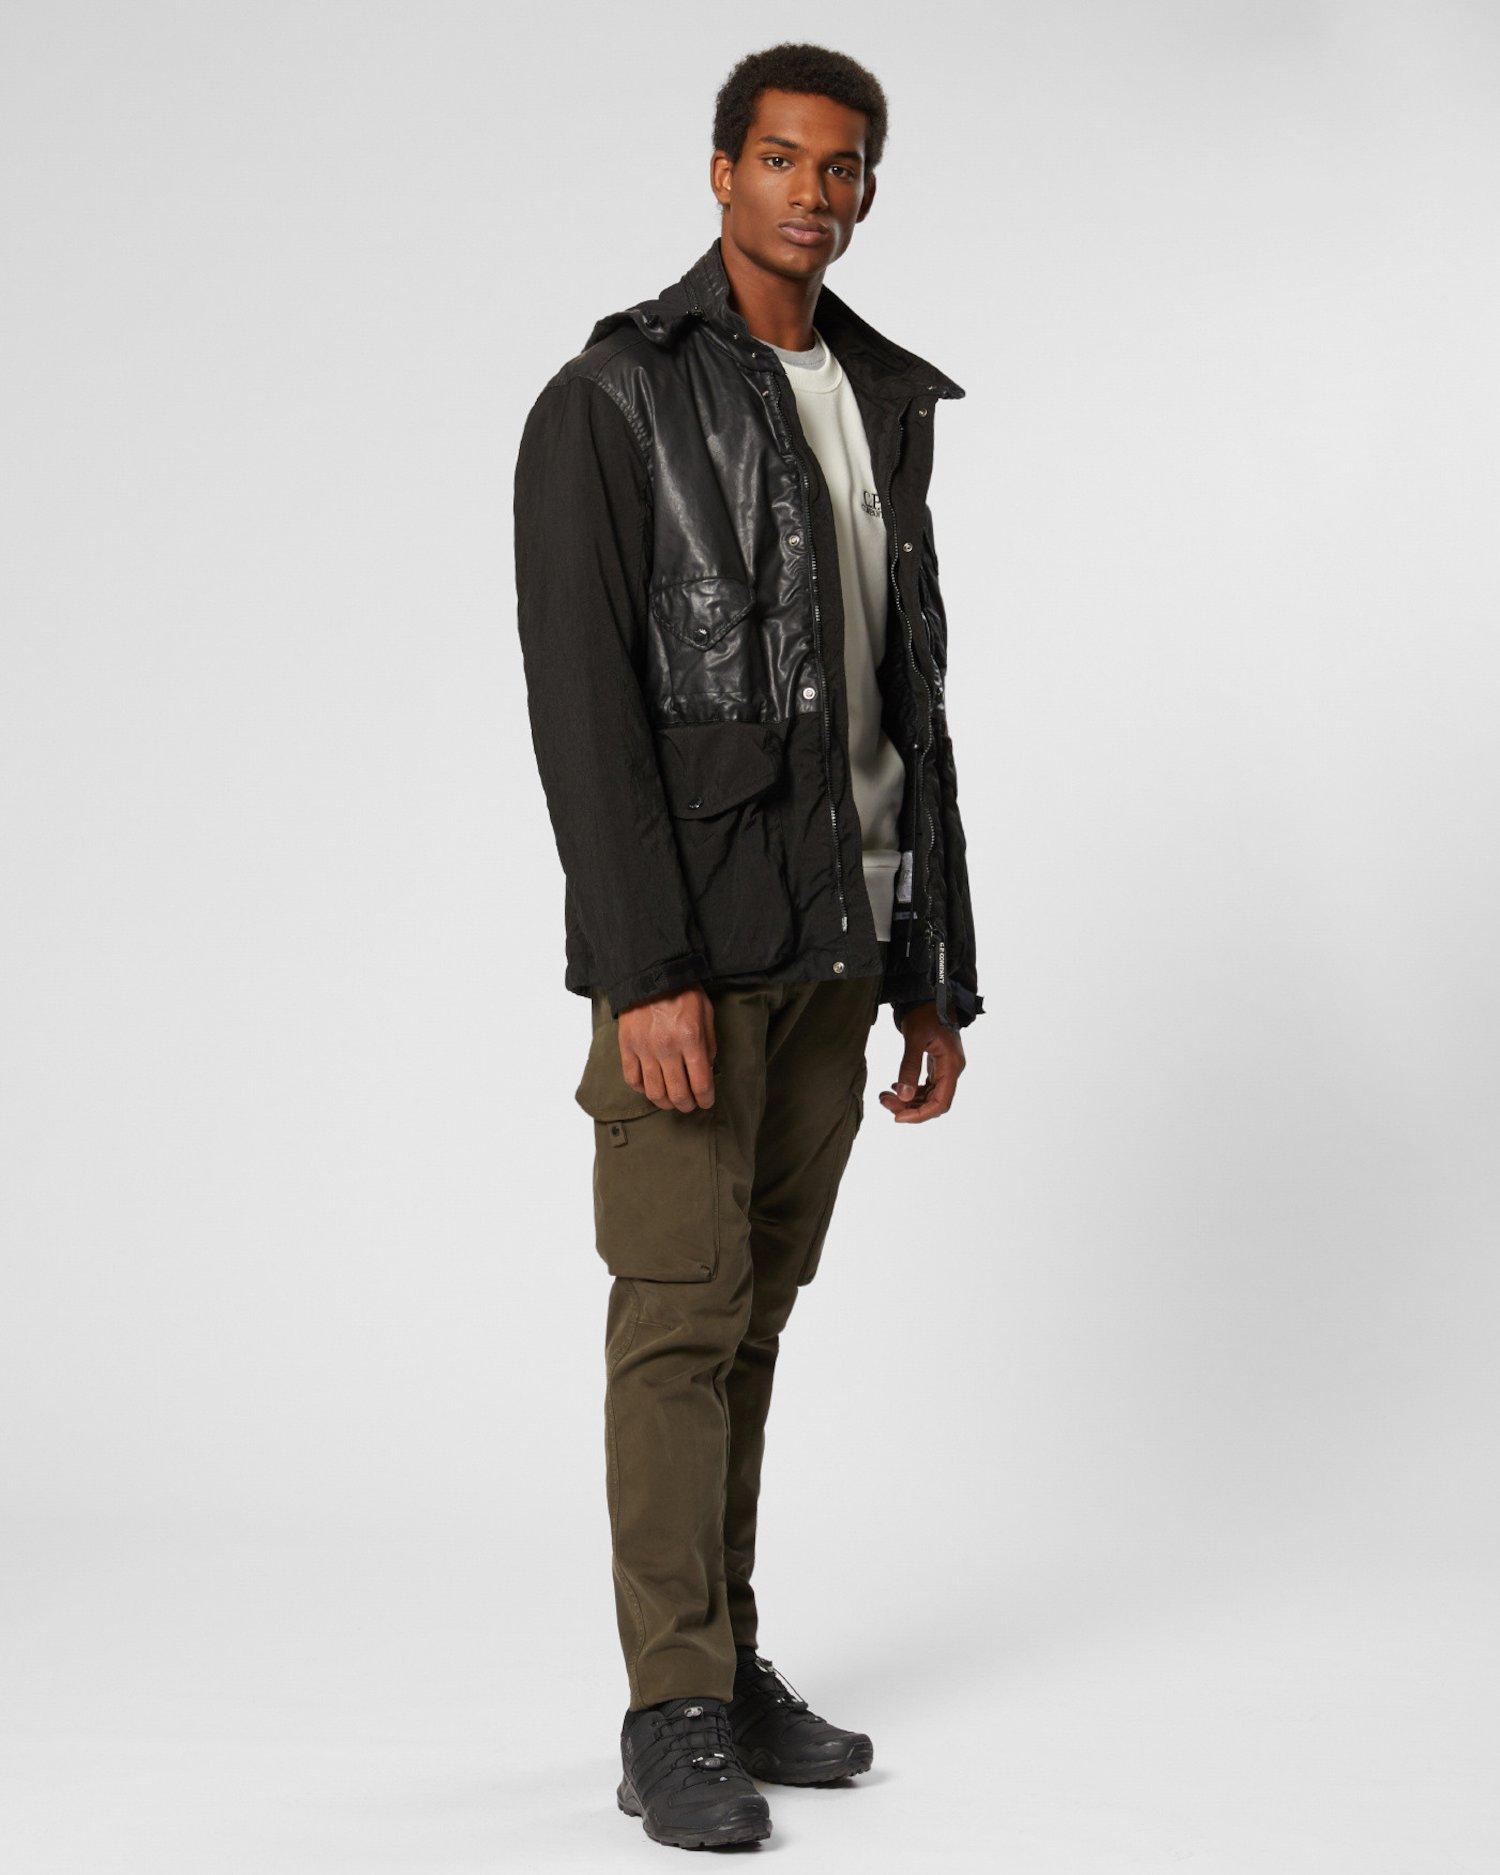 Jacke aus Quarz-Stoff mit kontrastierendem Goggle-Detail